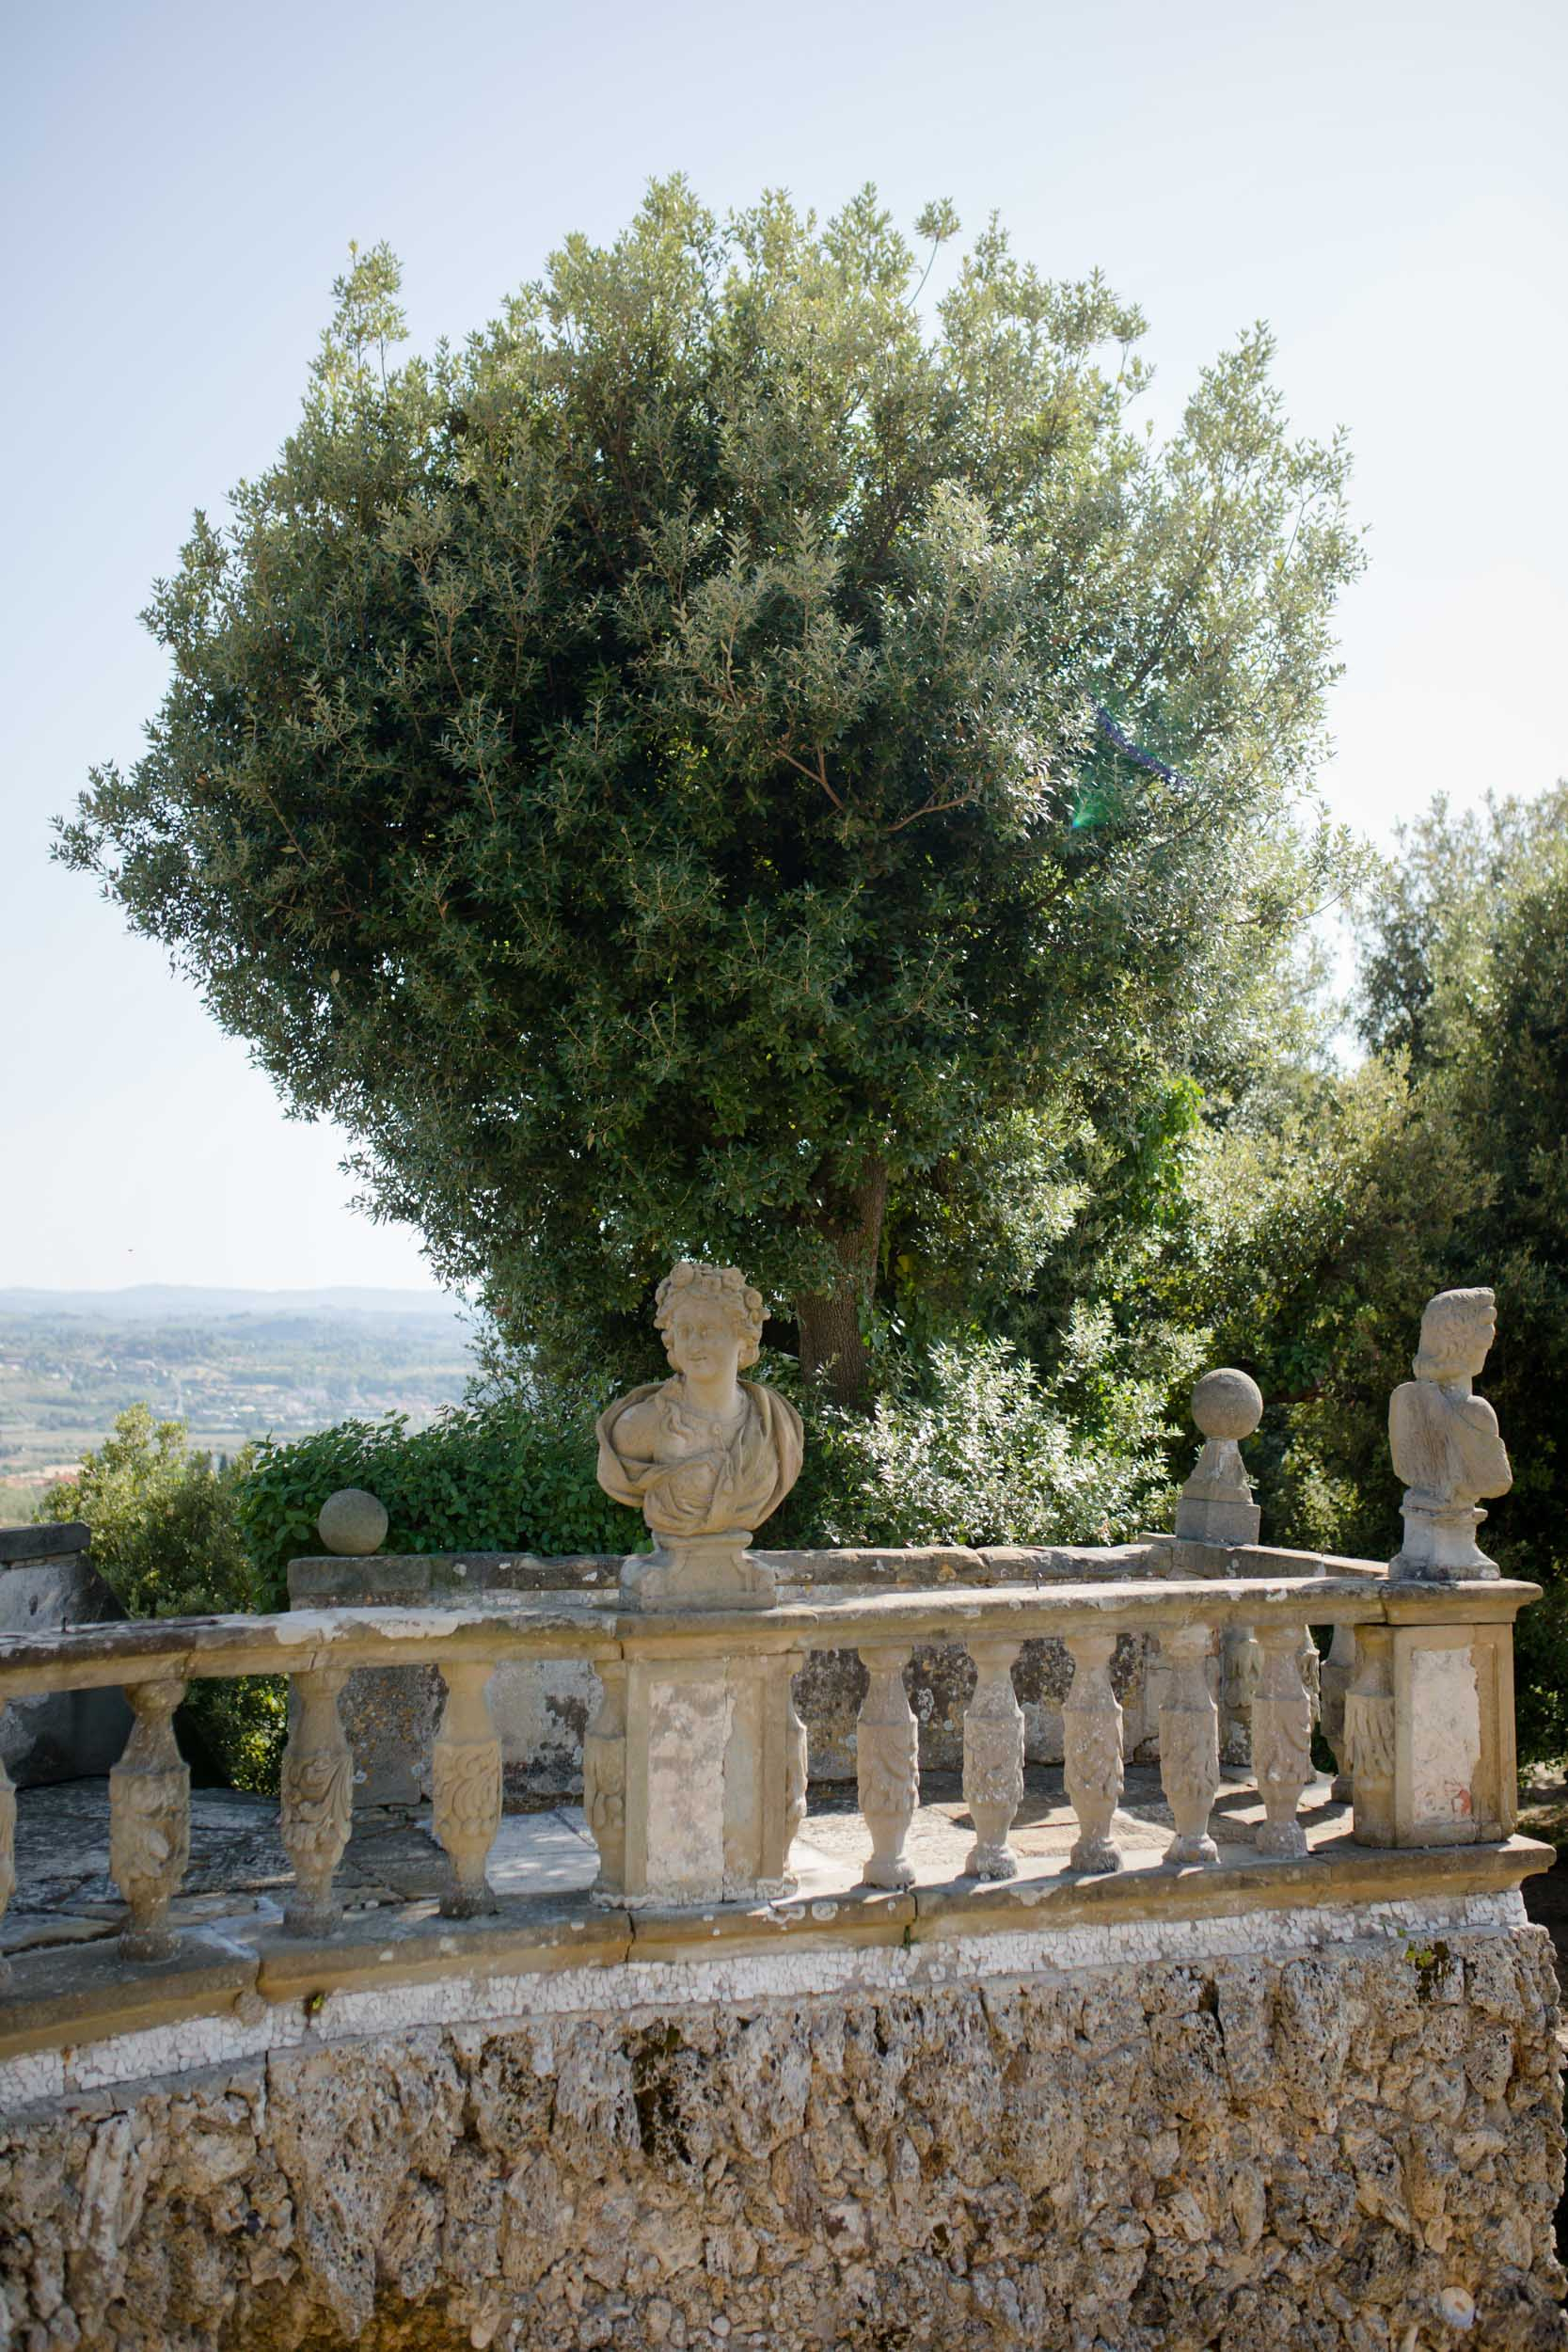 villa-gamberaia-florence-italy-destination-wedding-30.jpg